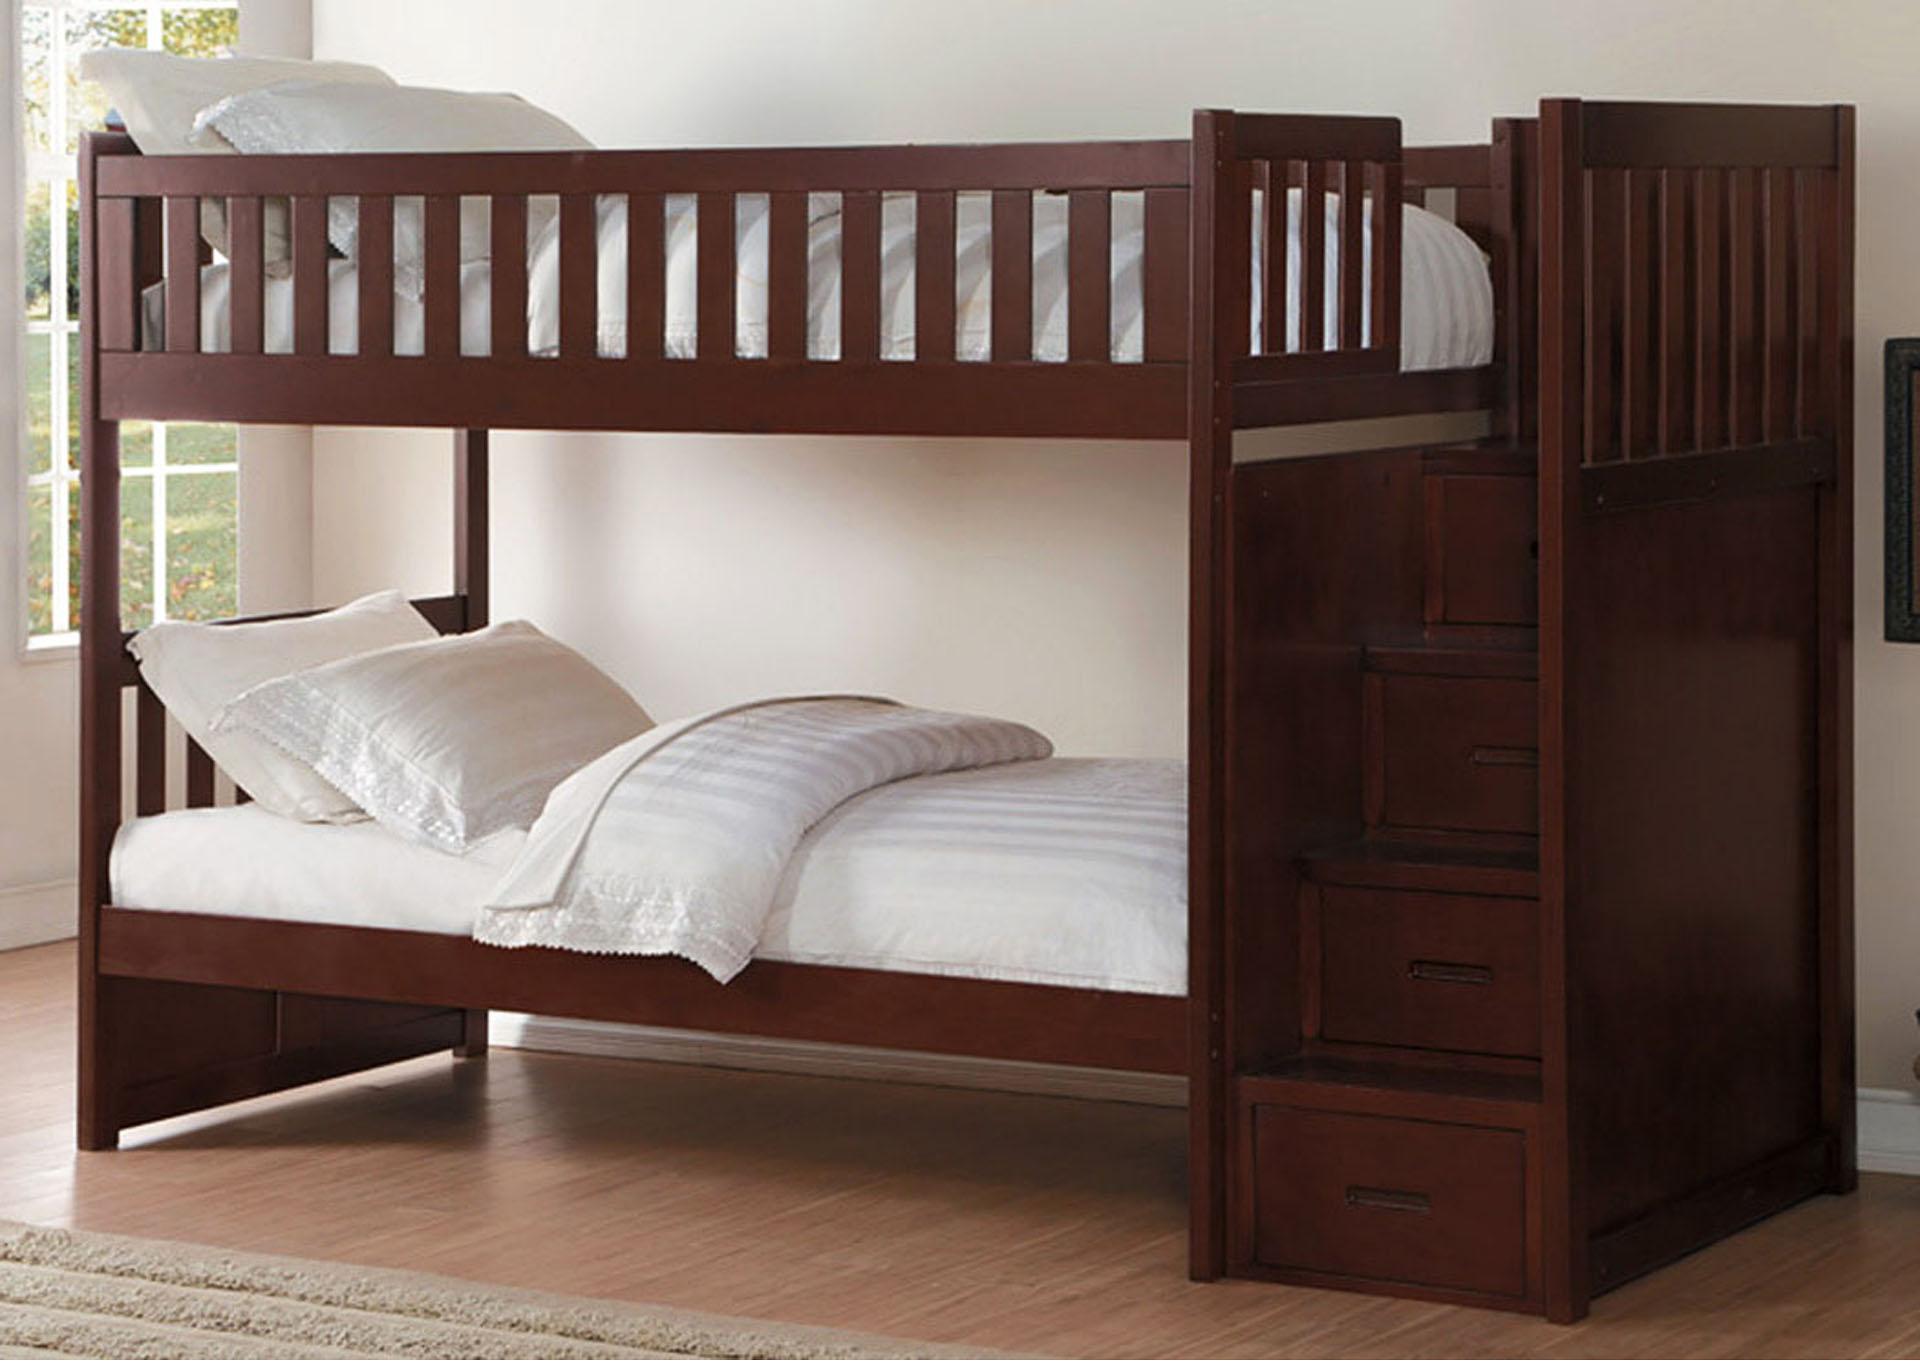 Bunk Bed W/Reversible Step Storage,Homelegance